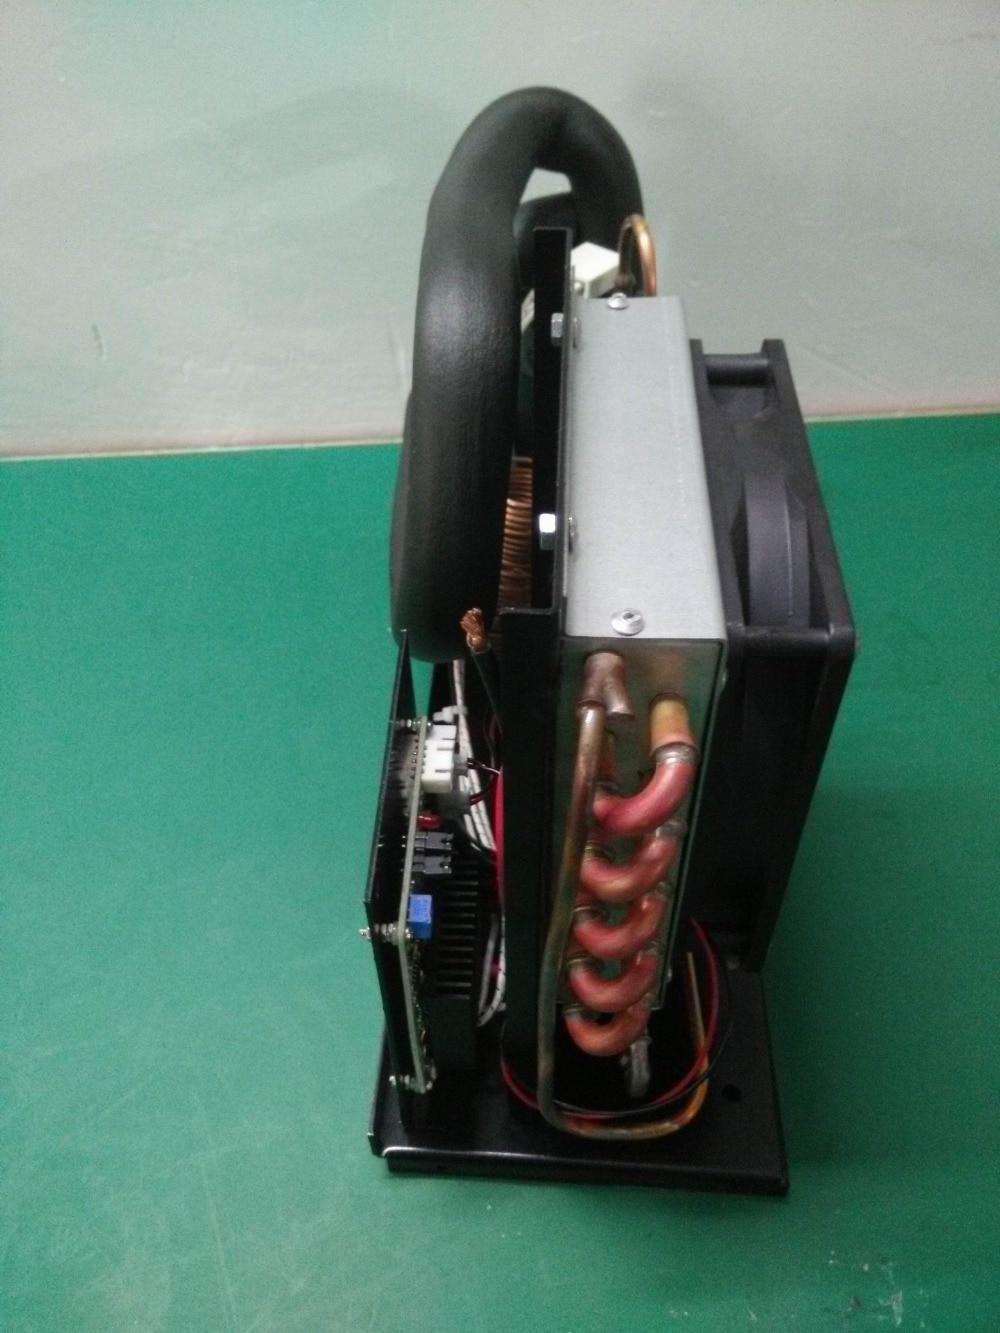 Super Mini 24v Unit For Portable Cooling Systmes Car